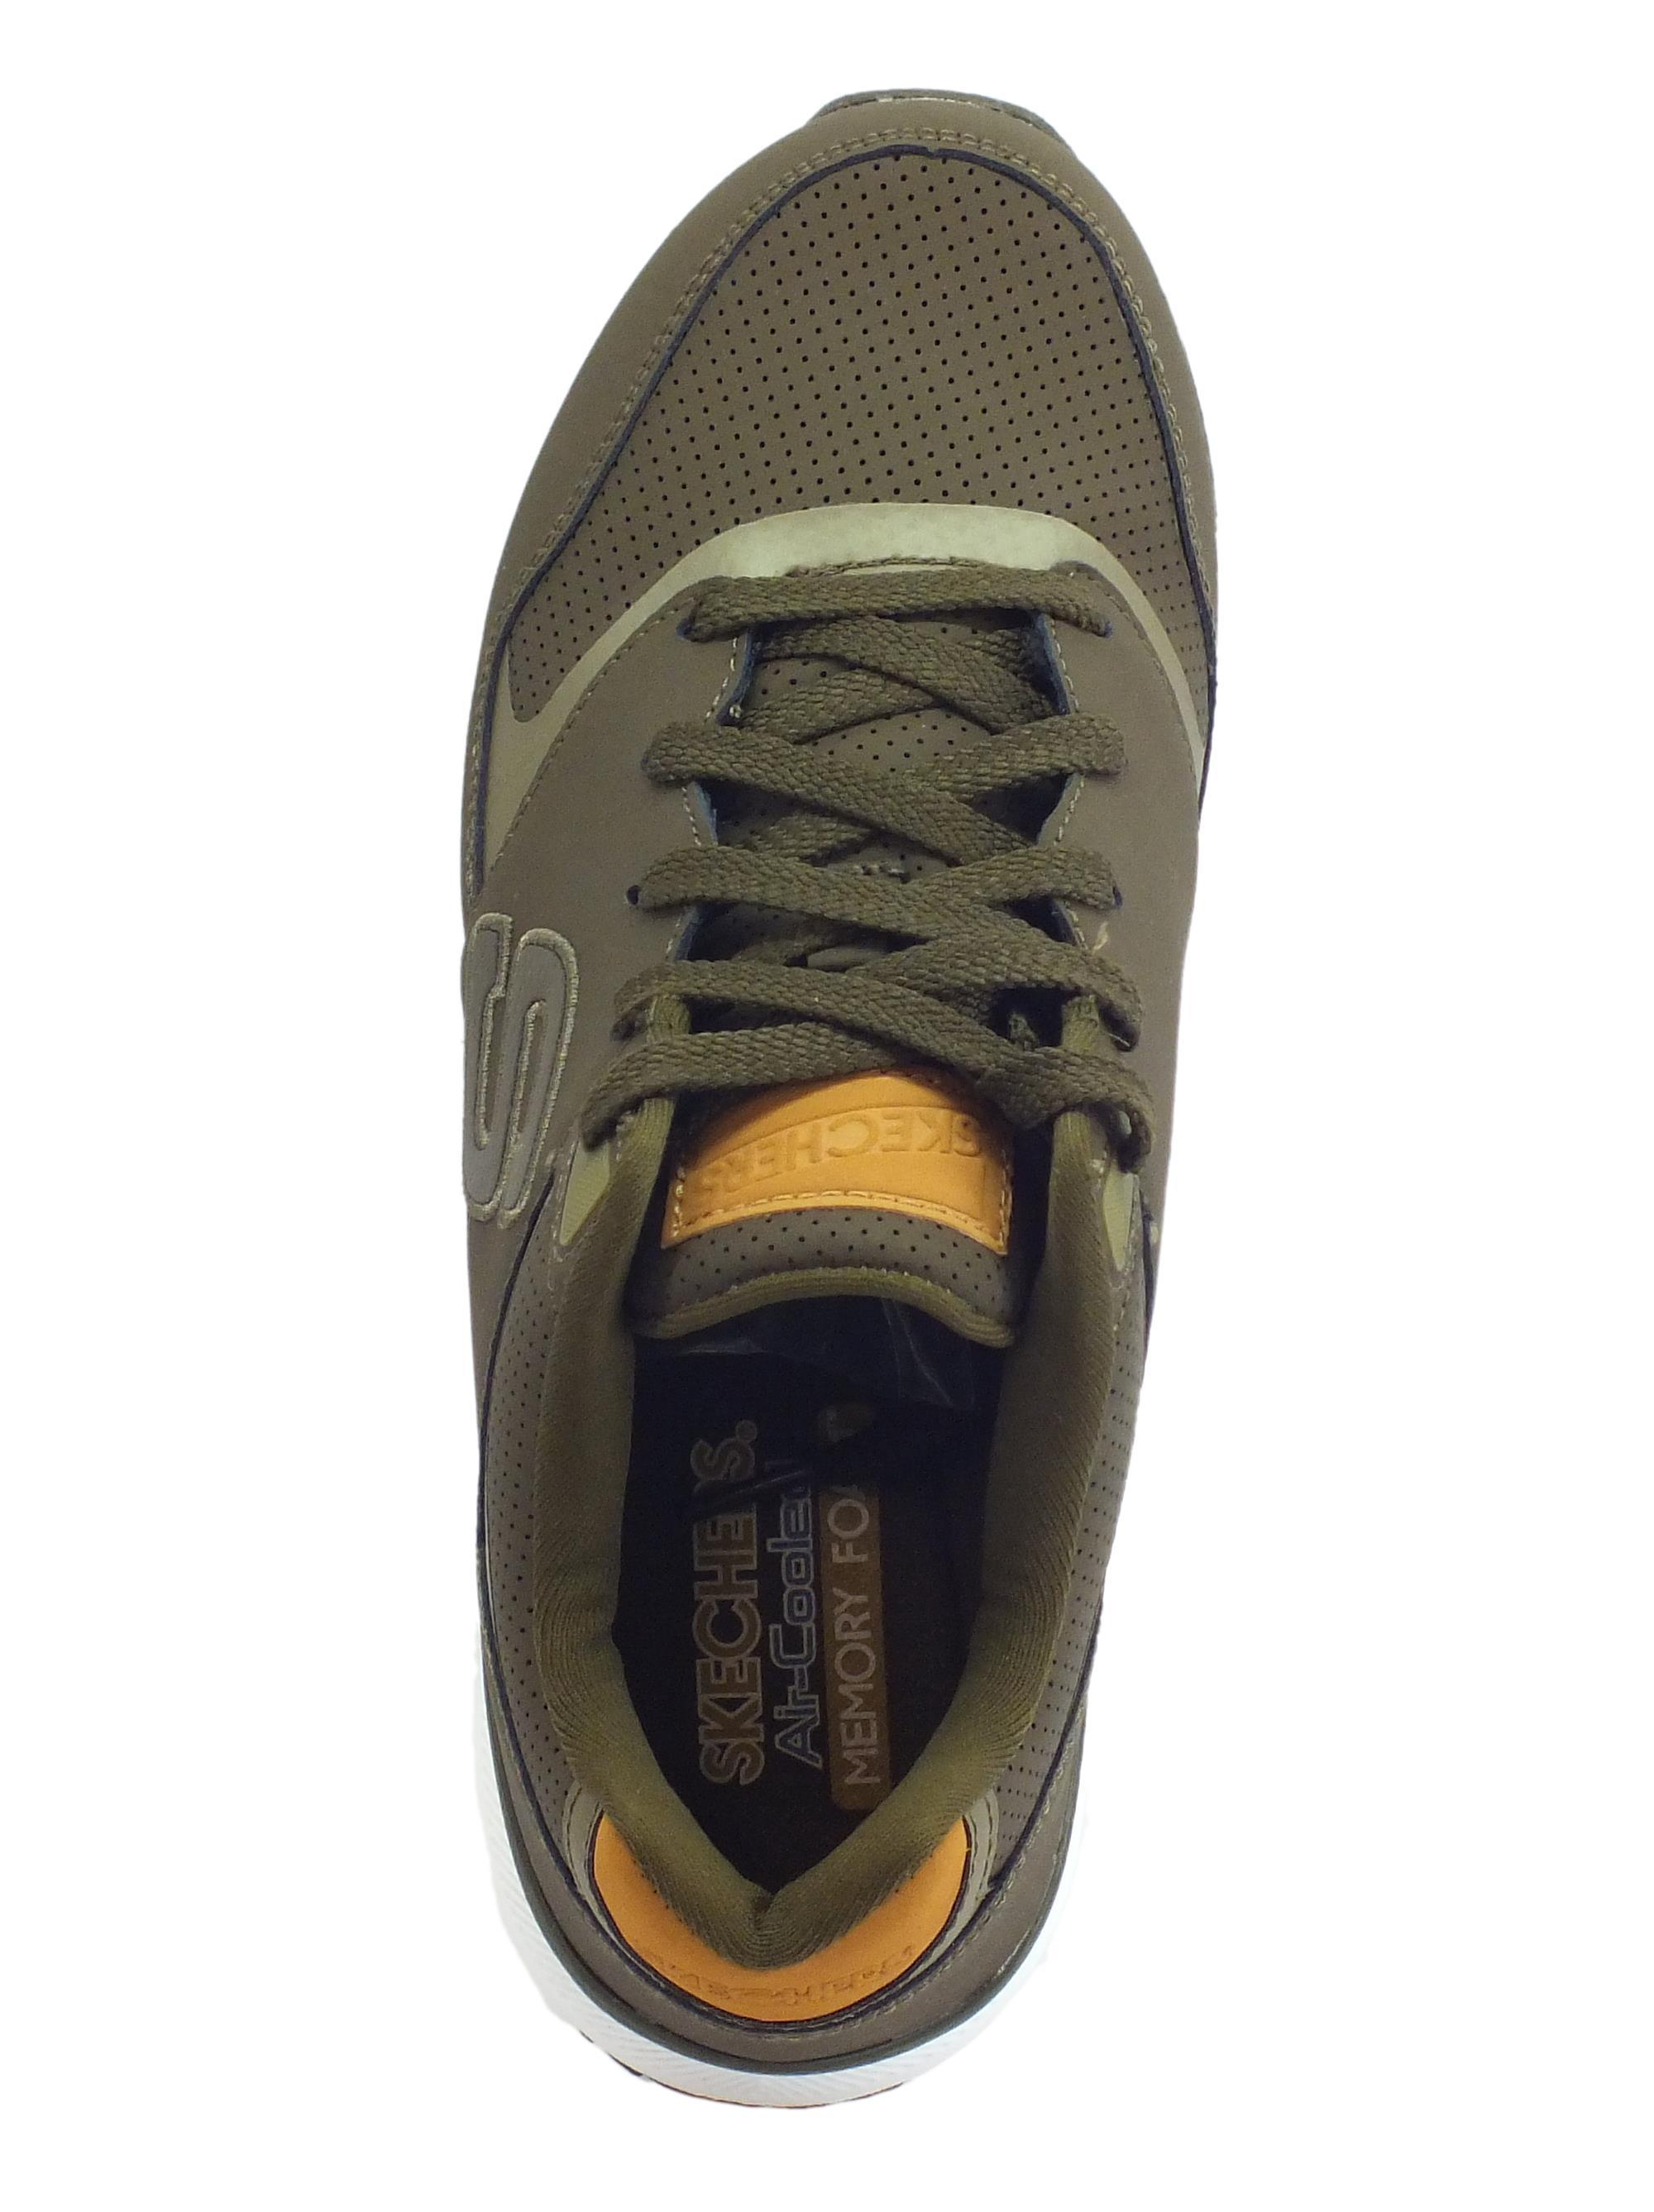 Ultime offerte SKECHERS Sneaker in pelle oliva Originals con